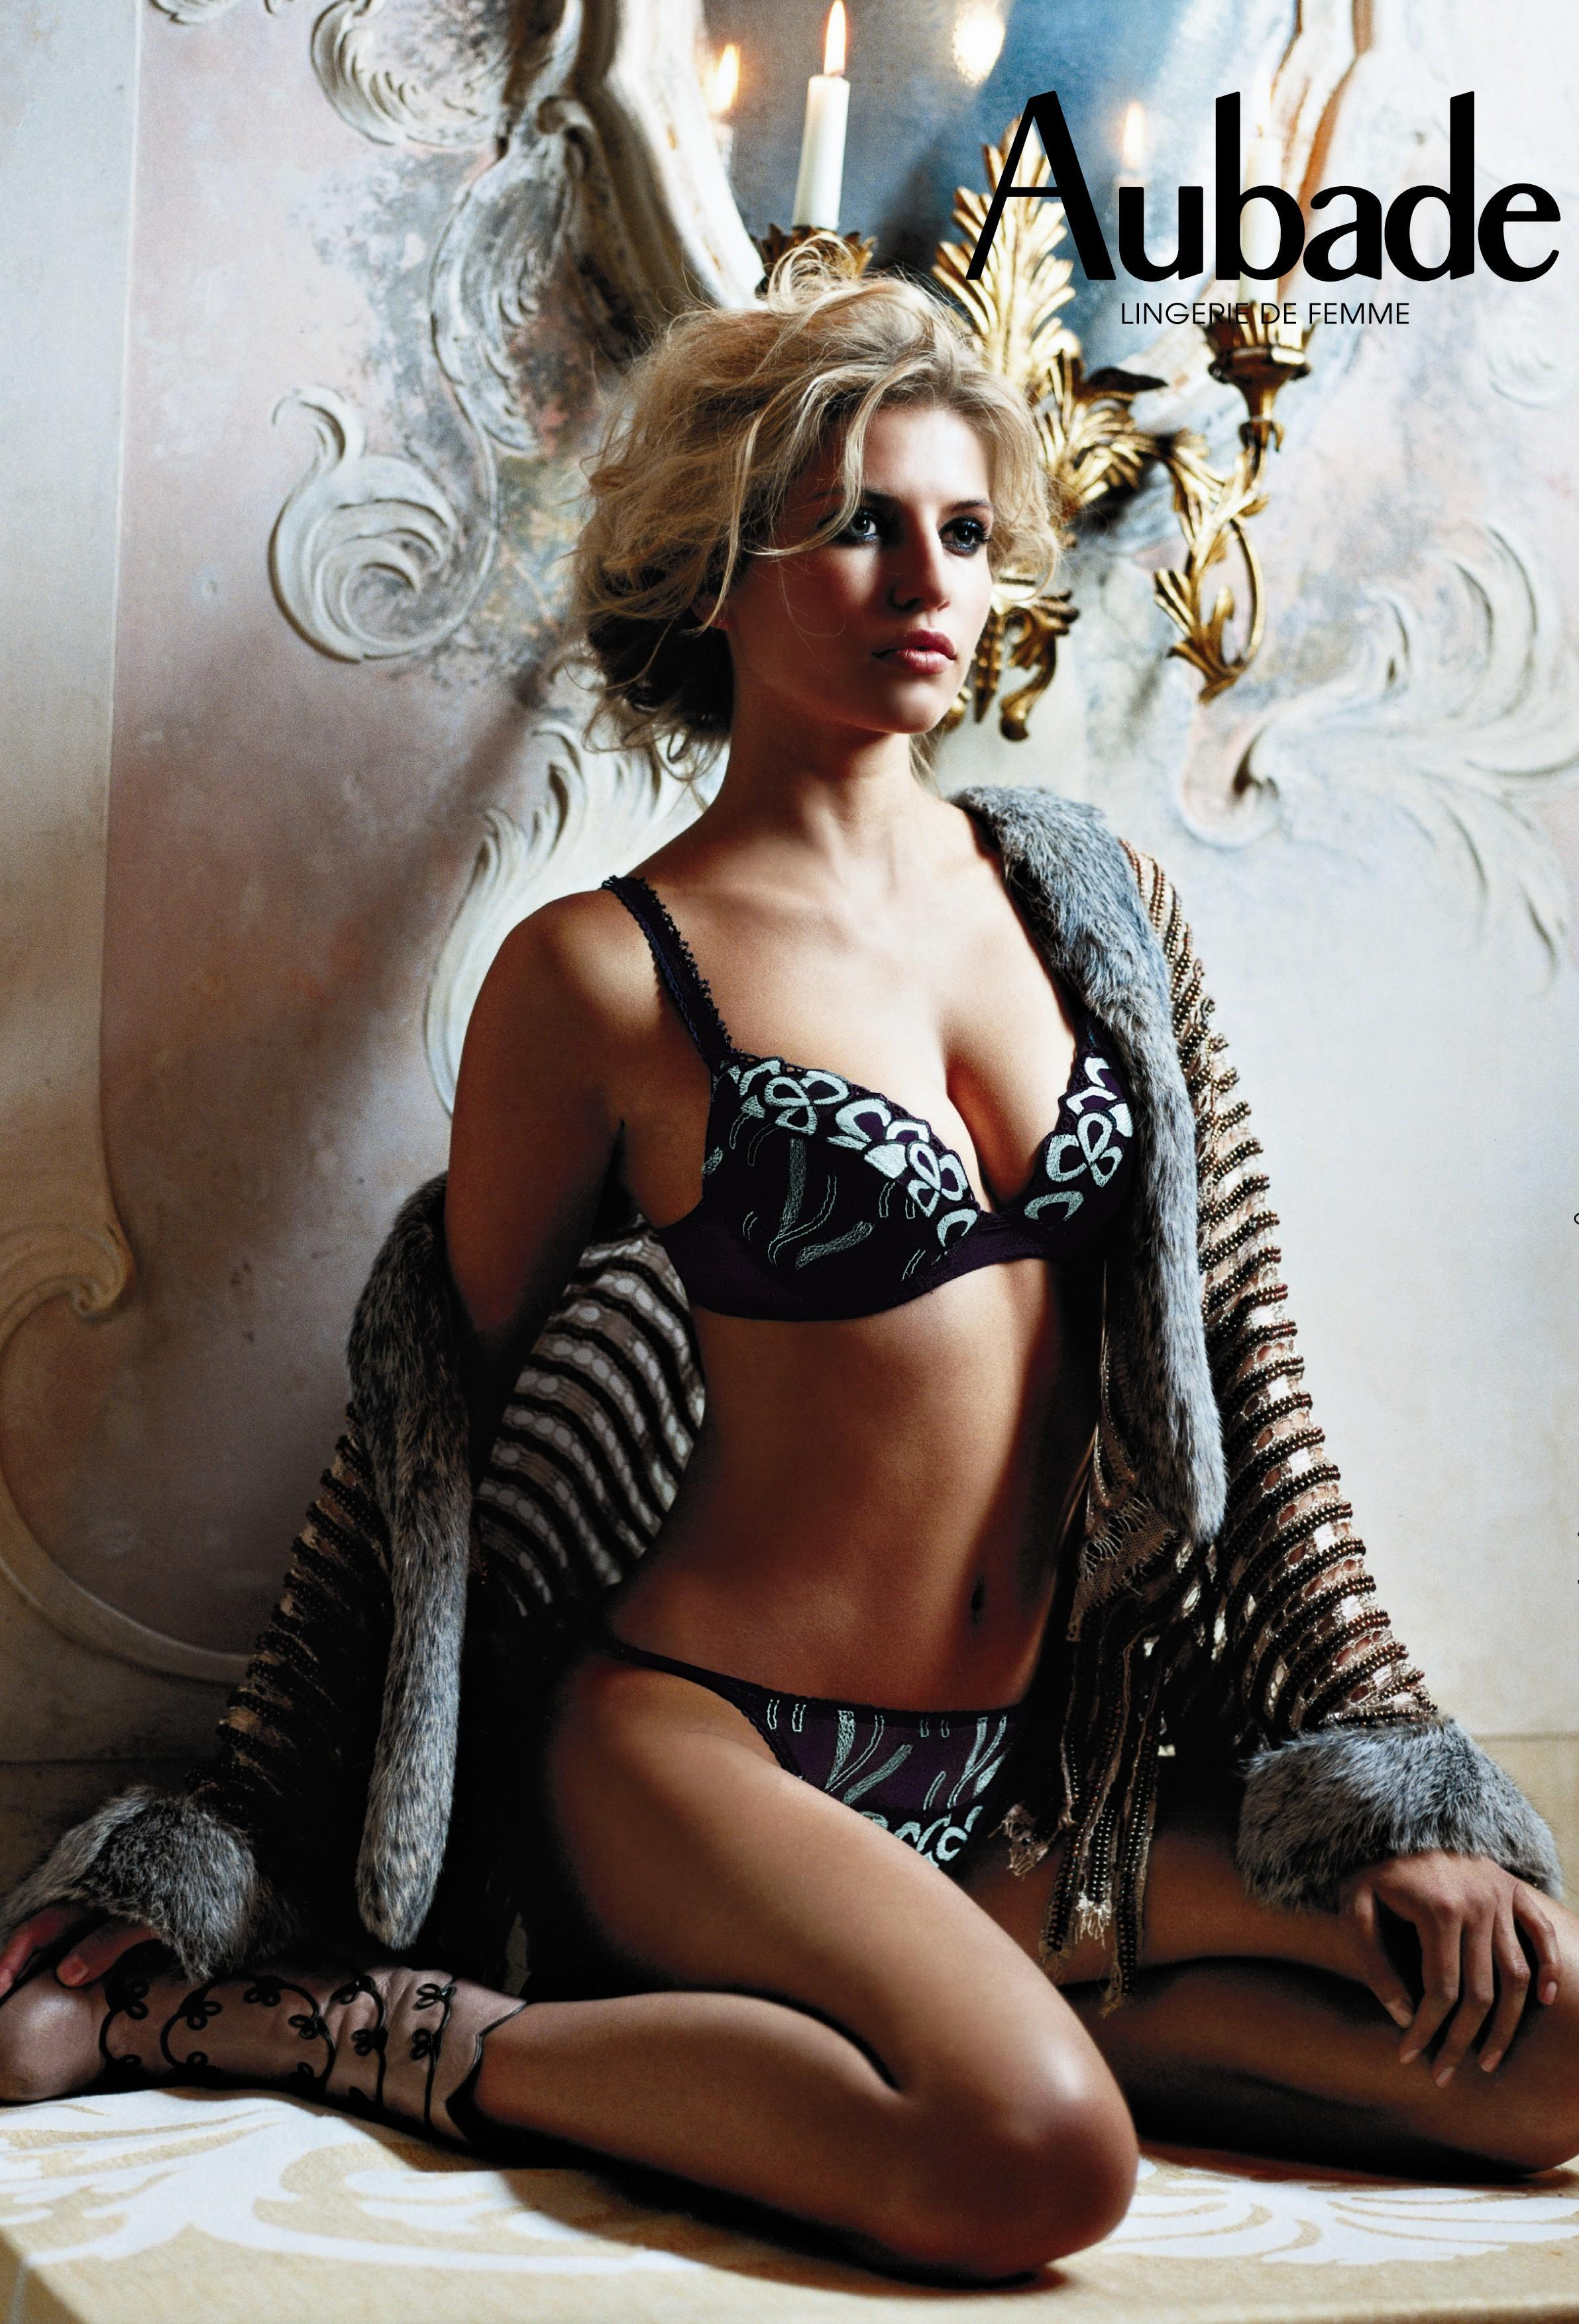 Twitter Alexandra Zimny nudes (79 photos), Pussy, Bikini, Twitter, panties 2006